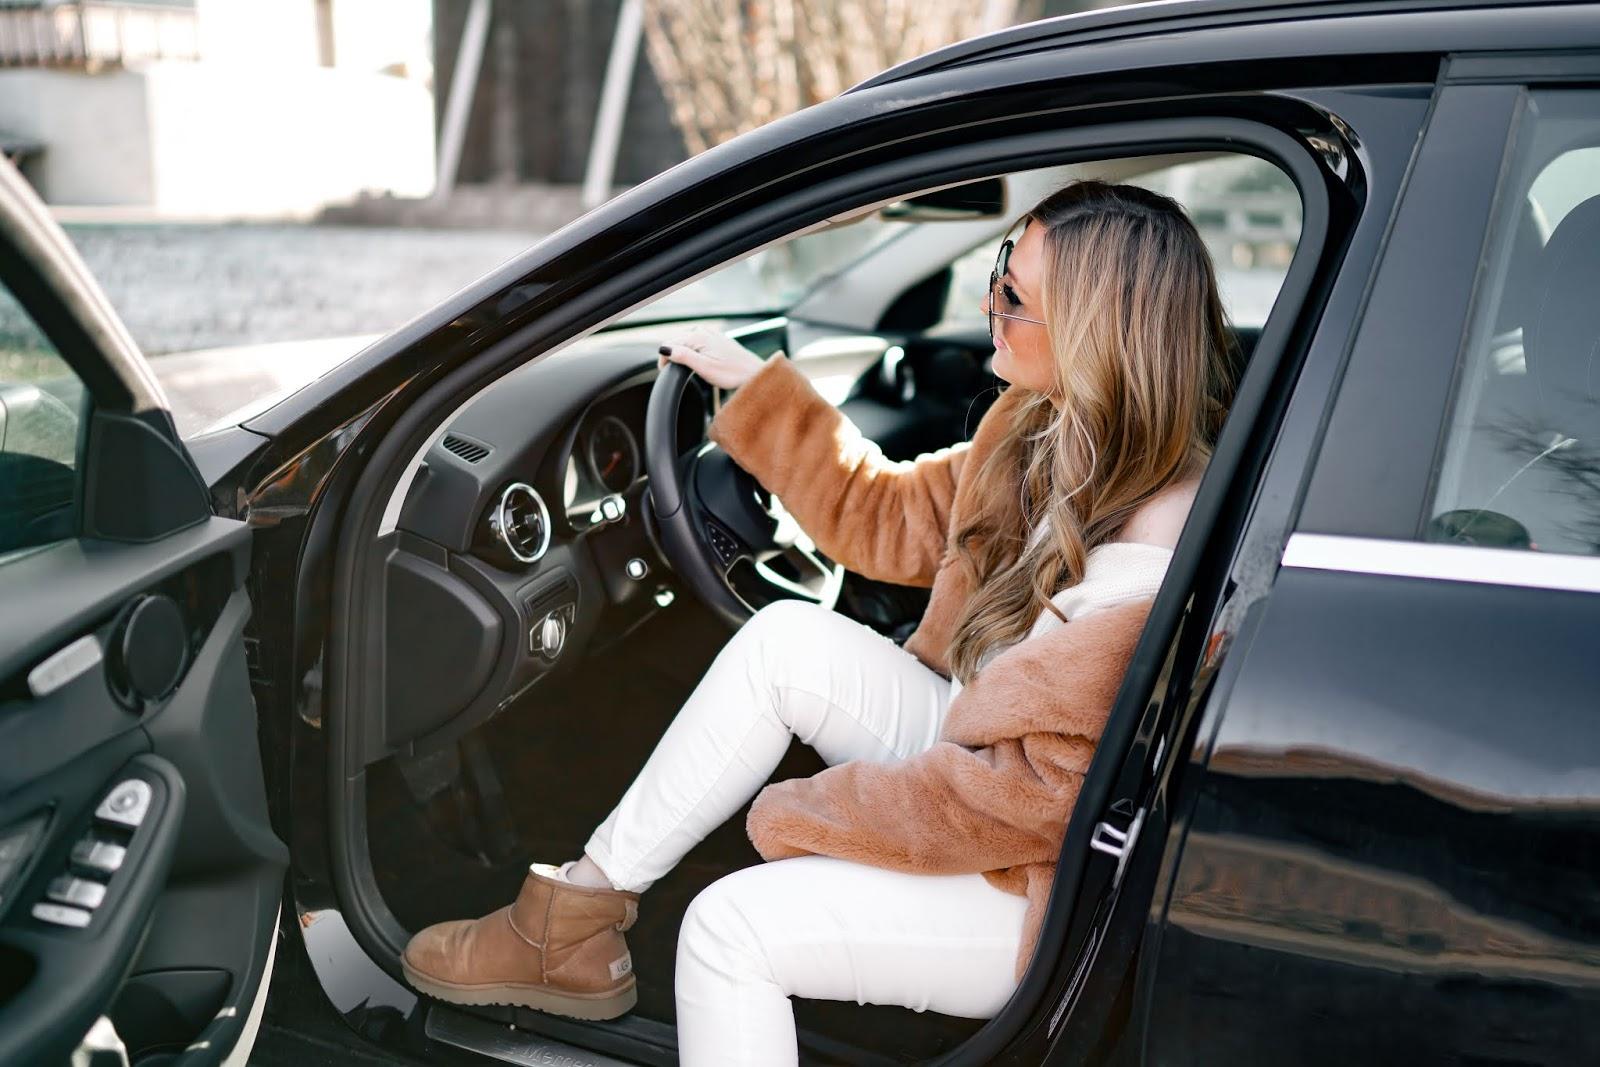 winteroutfit-ugg-boots-kombinieren-winterstyle-fashionstylebyjohanna-braune-schuhe-teddymantel